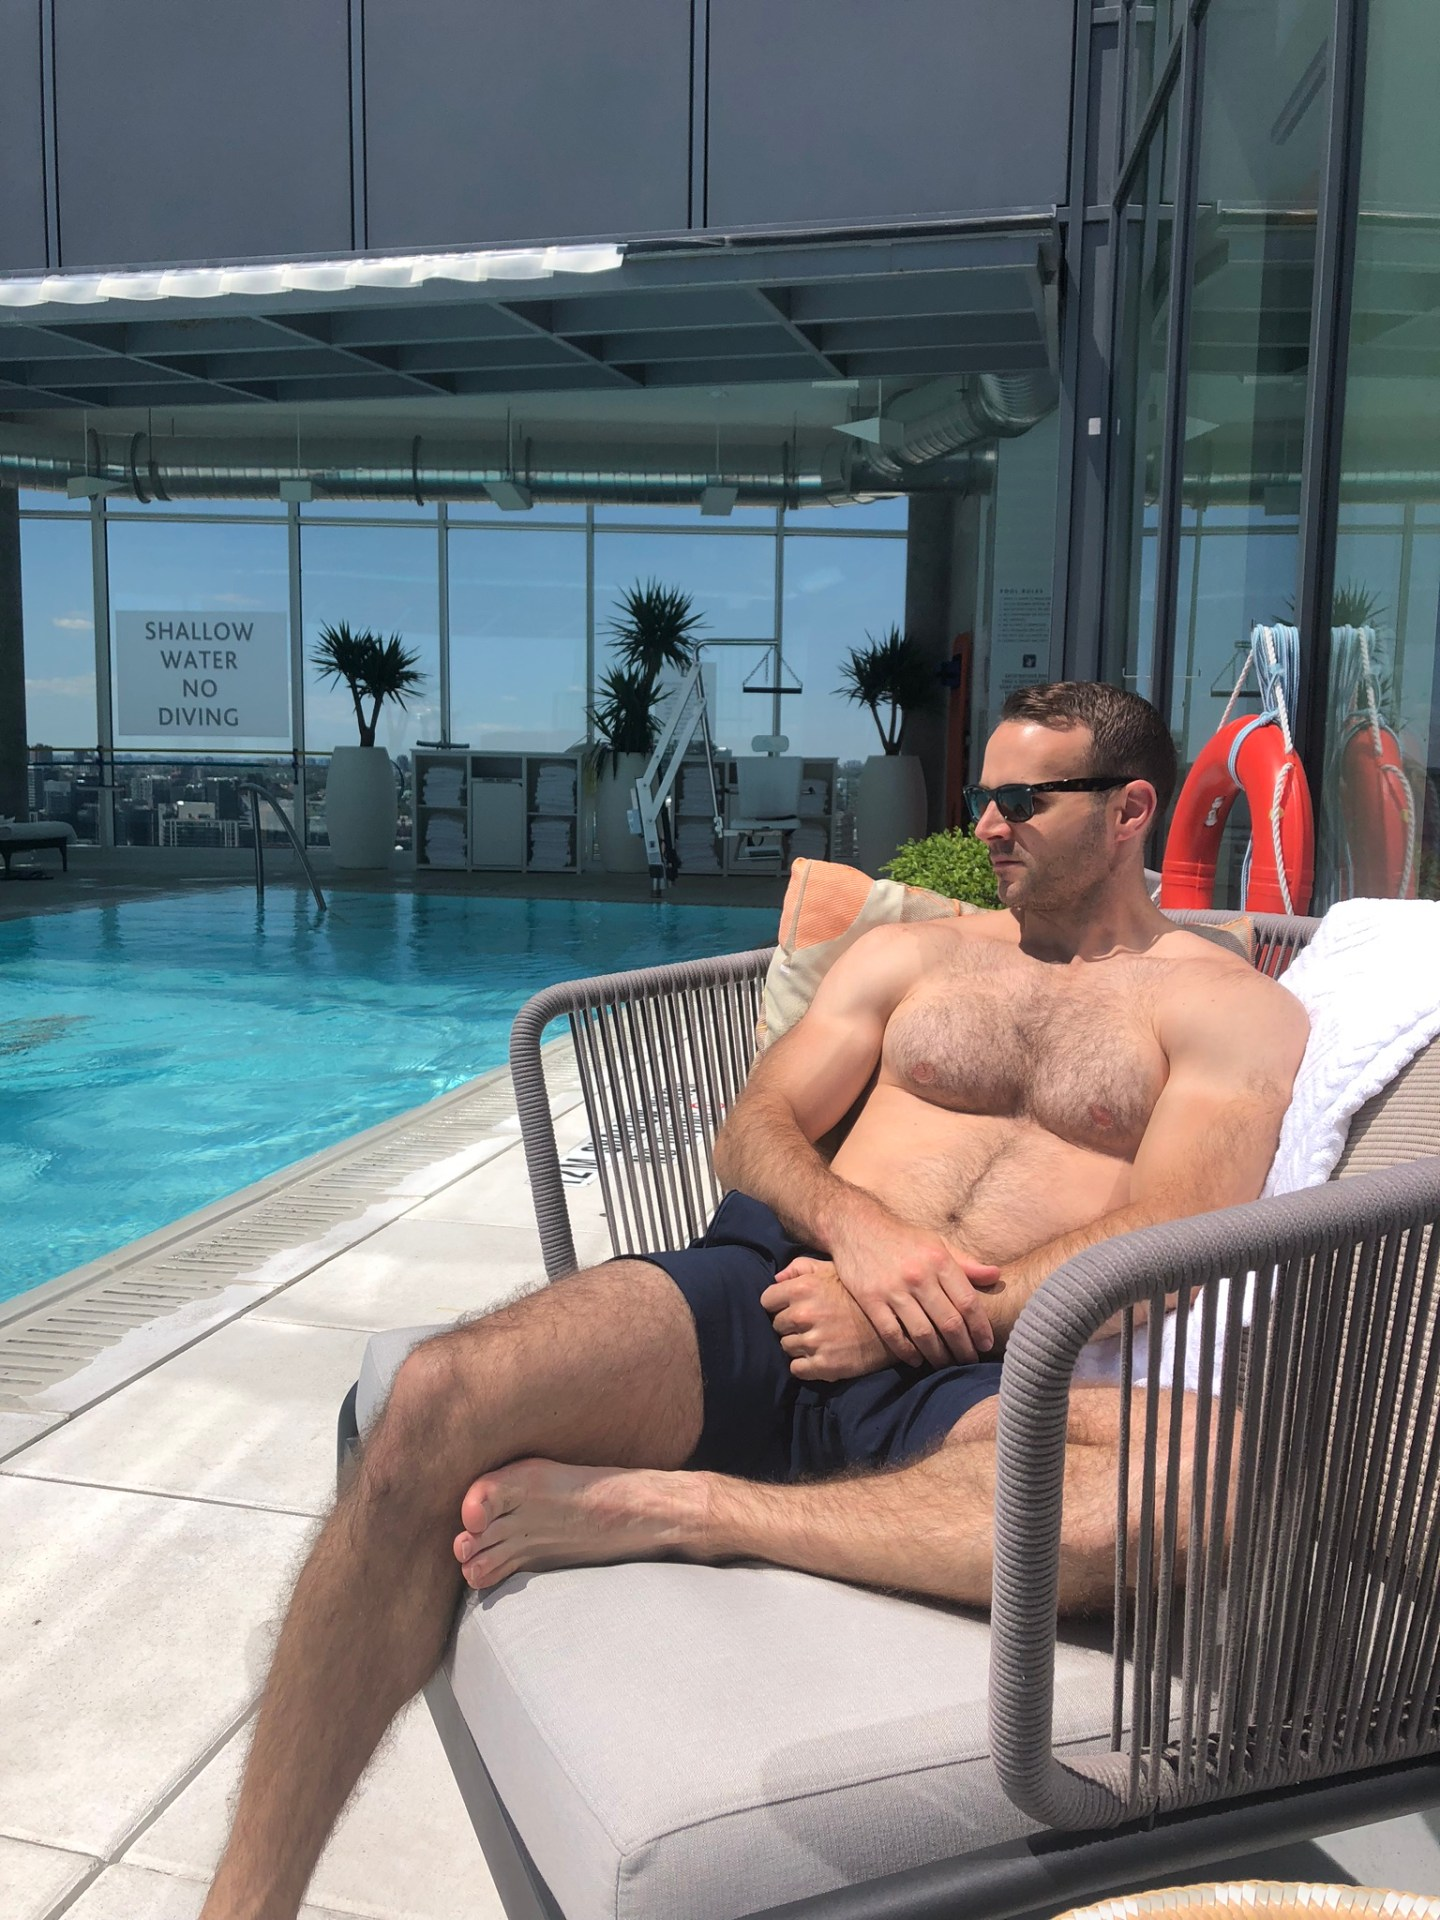 Summer in Toronto: sunbathing at a rooftop pool